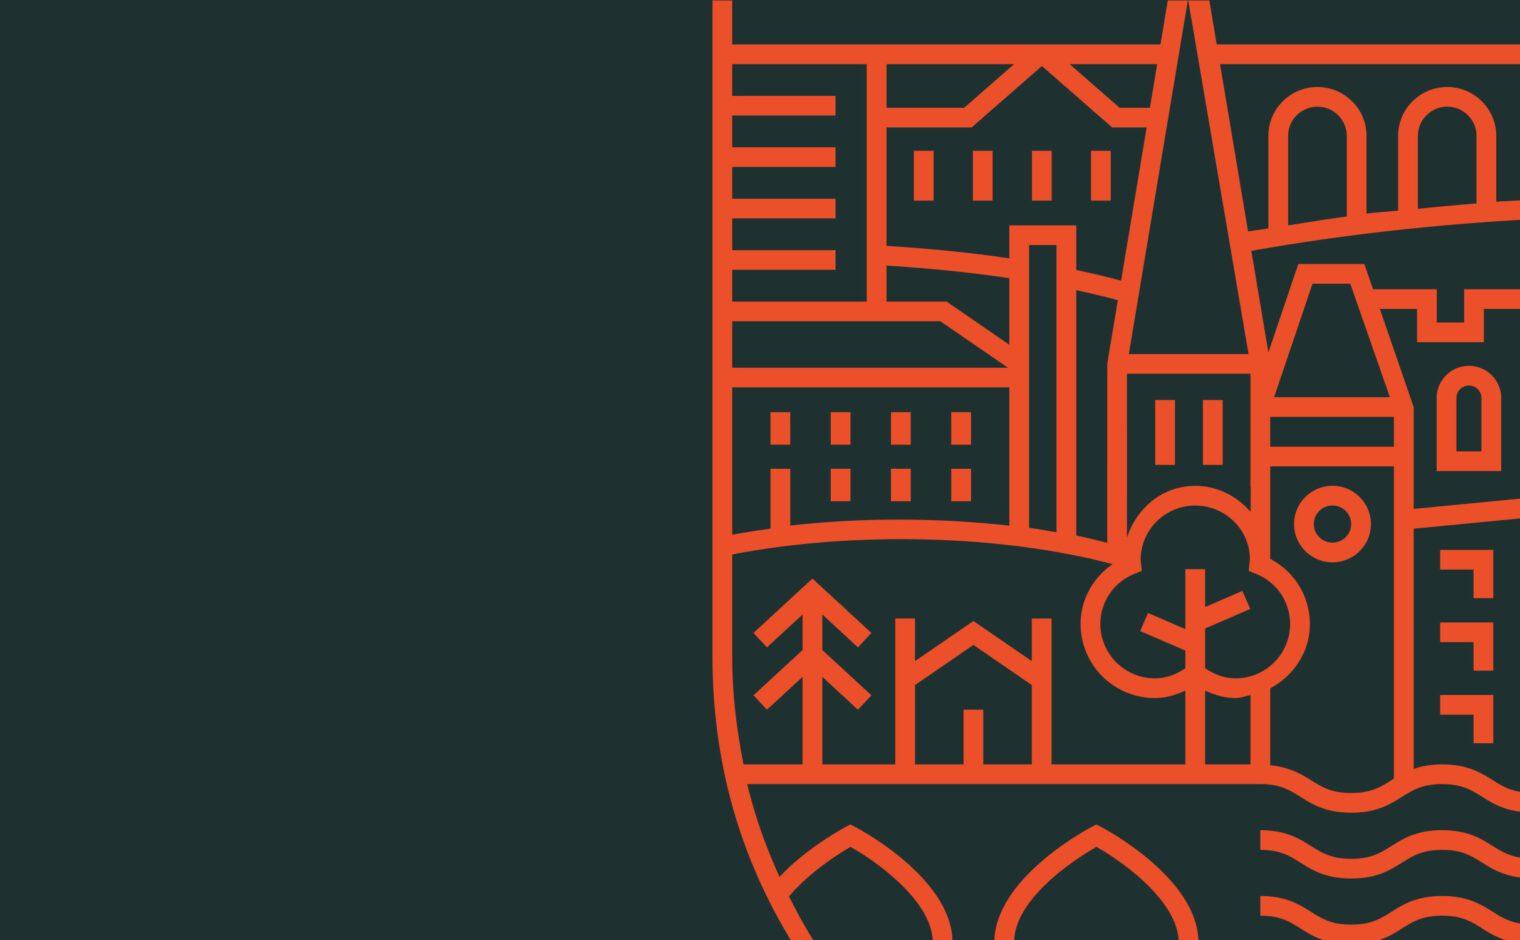 Wakefield Civic Society logo detail